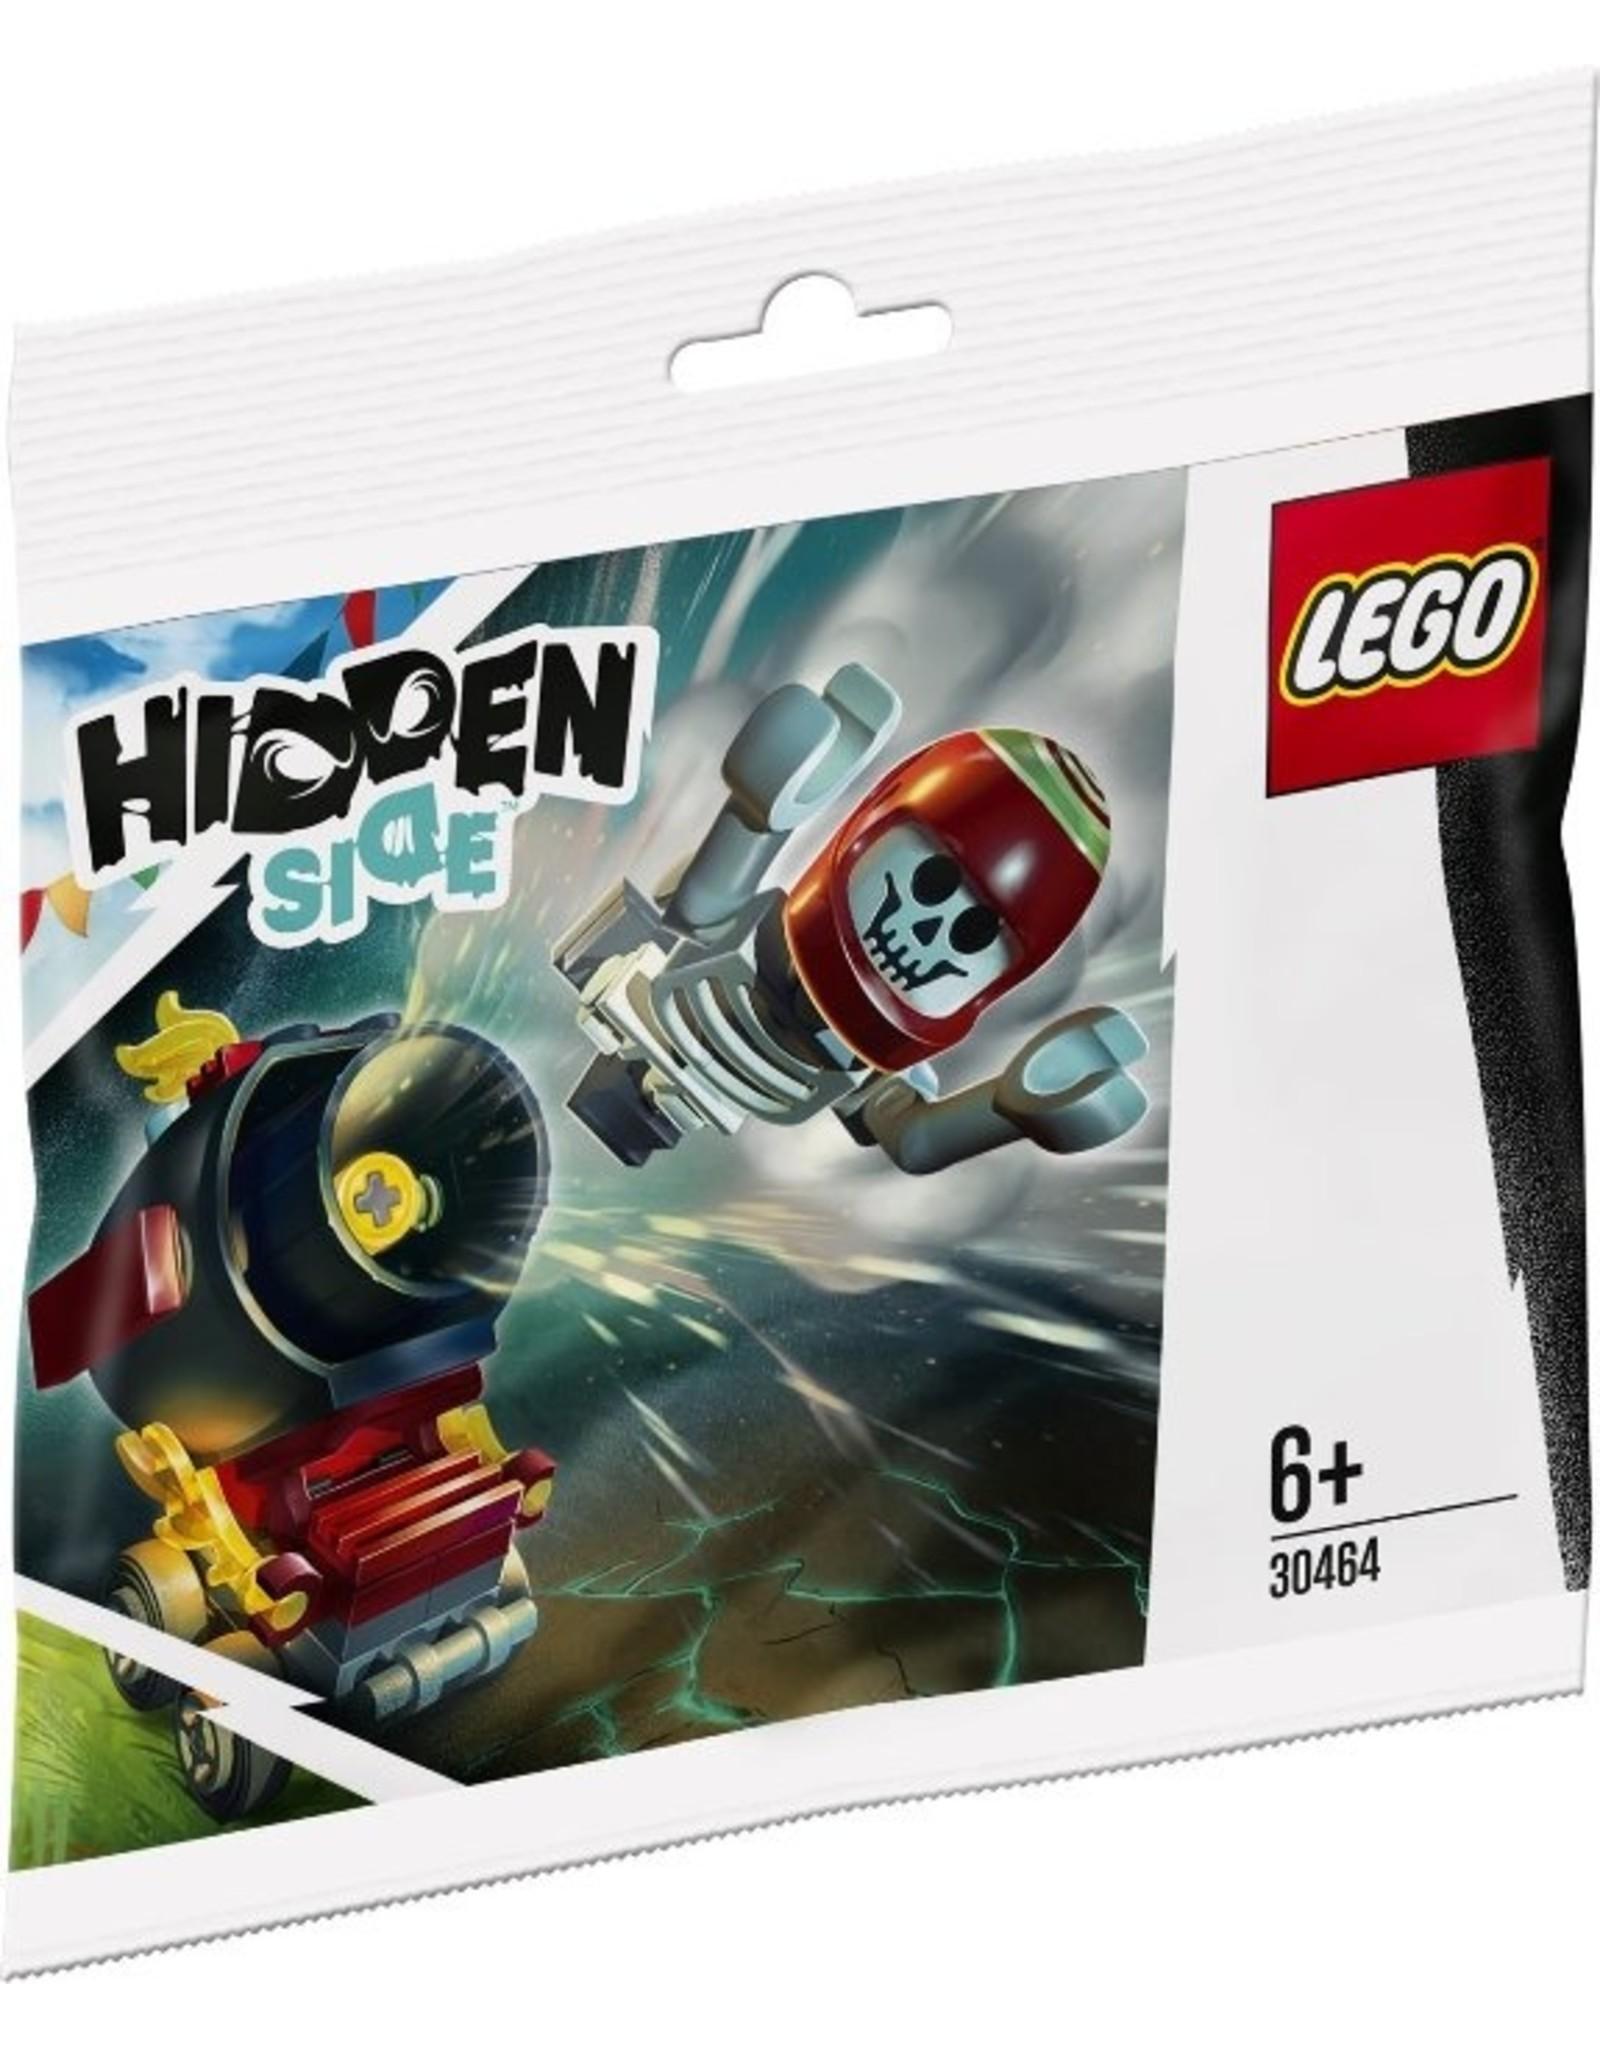 LEGO LEGO Hidden Side 30464 El Fuego's Stunt Cannon (Polybag)